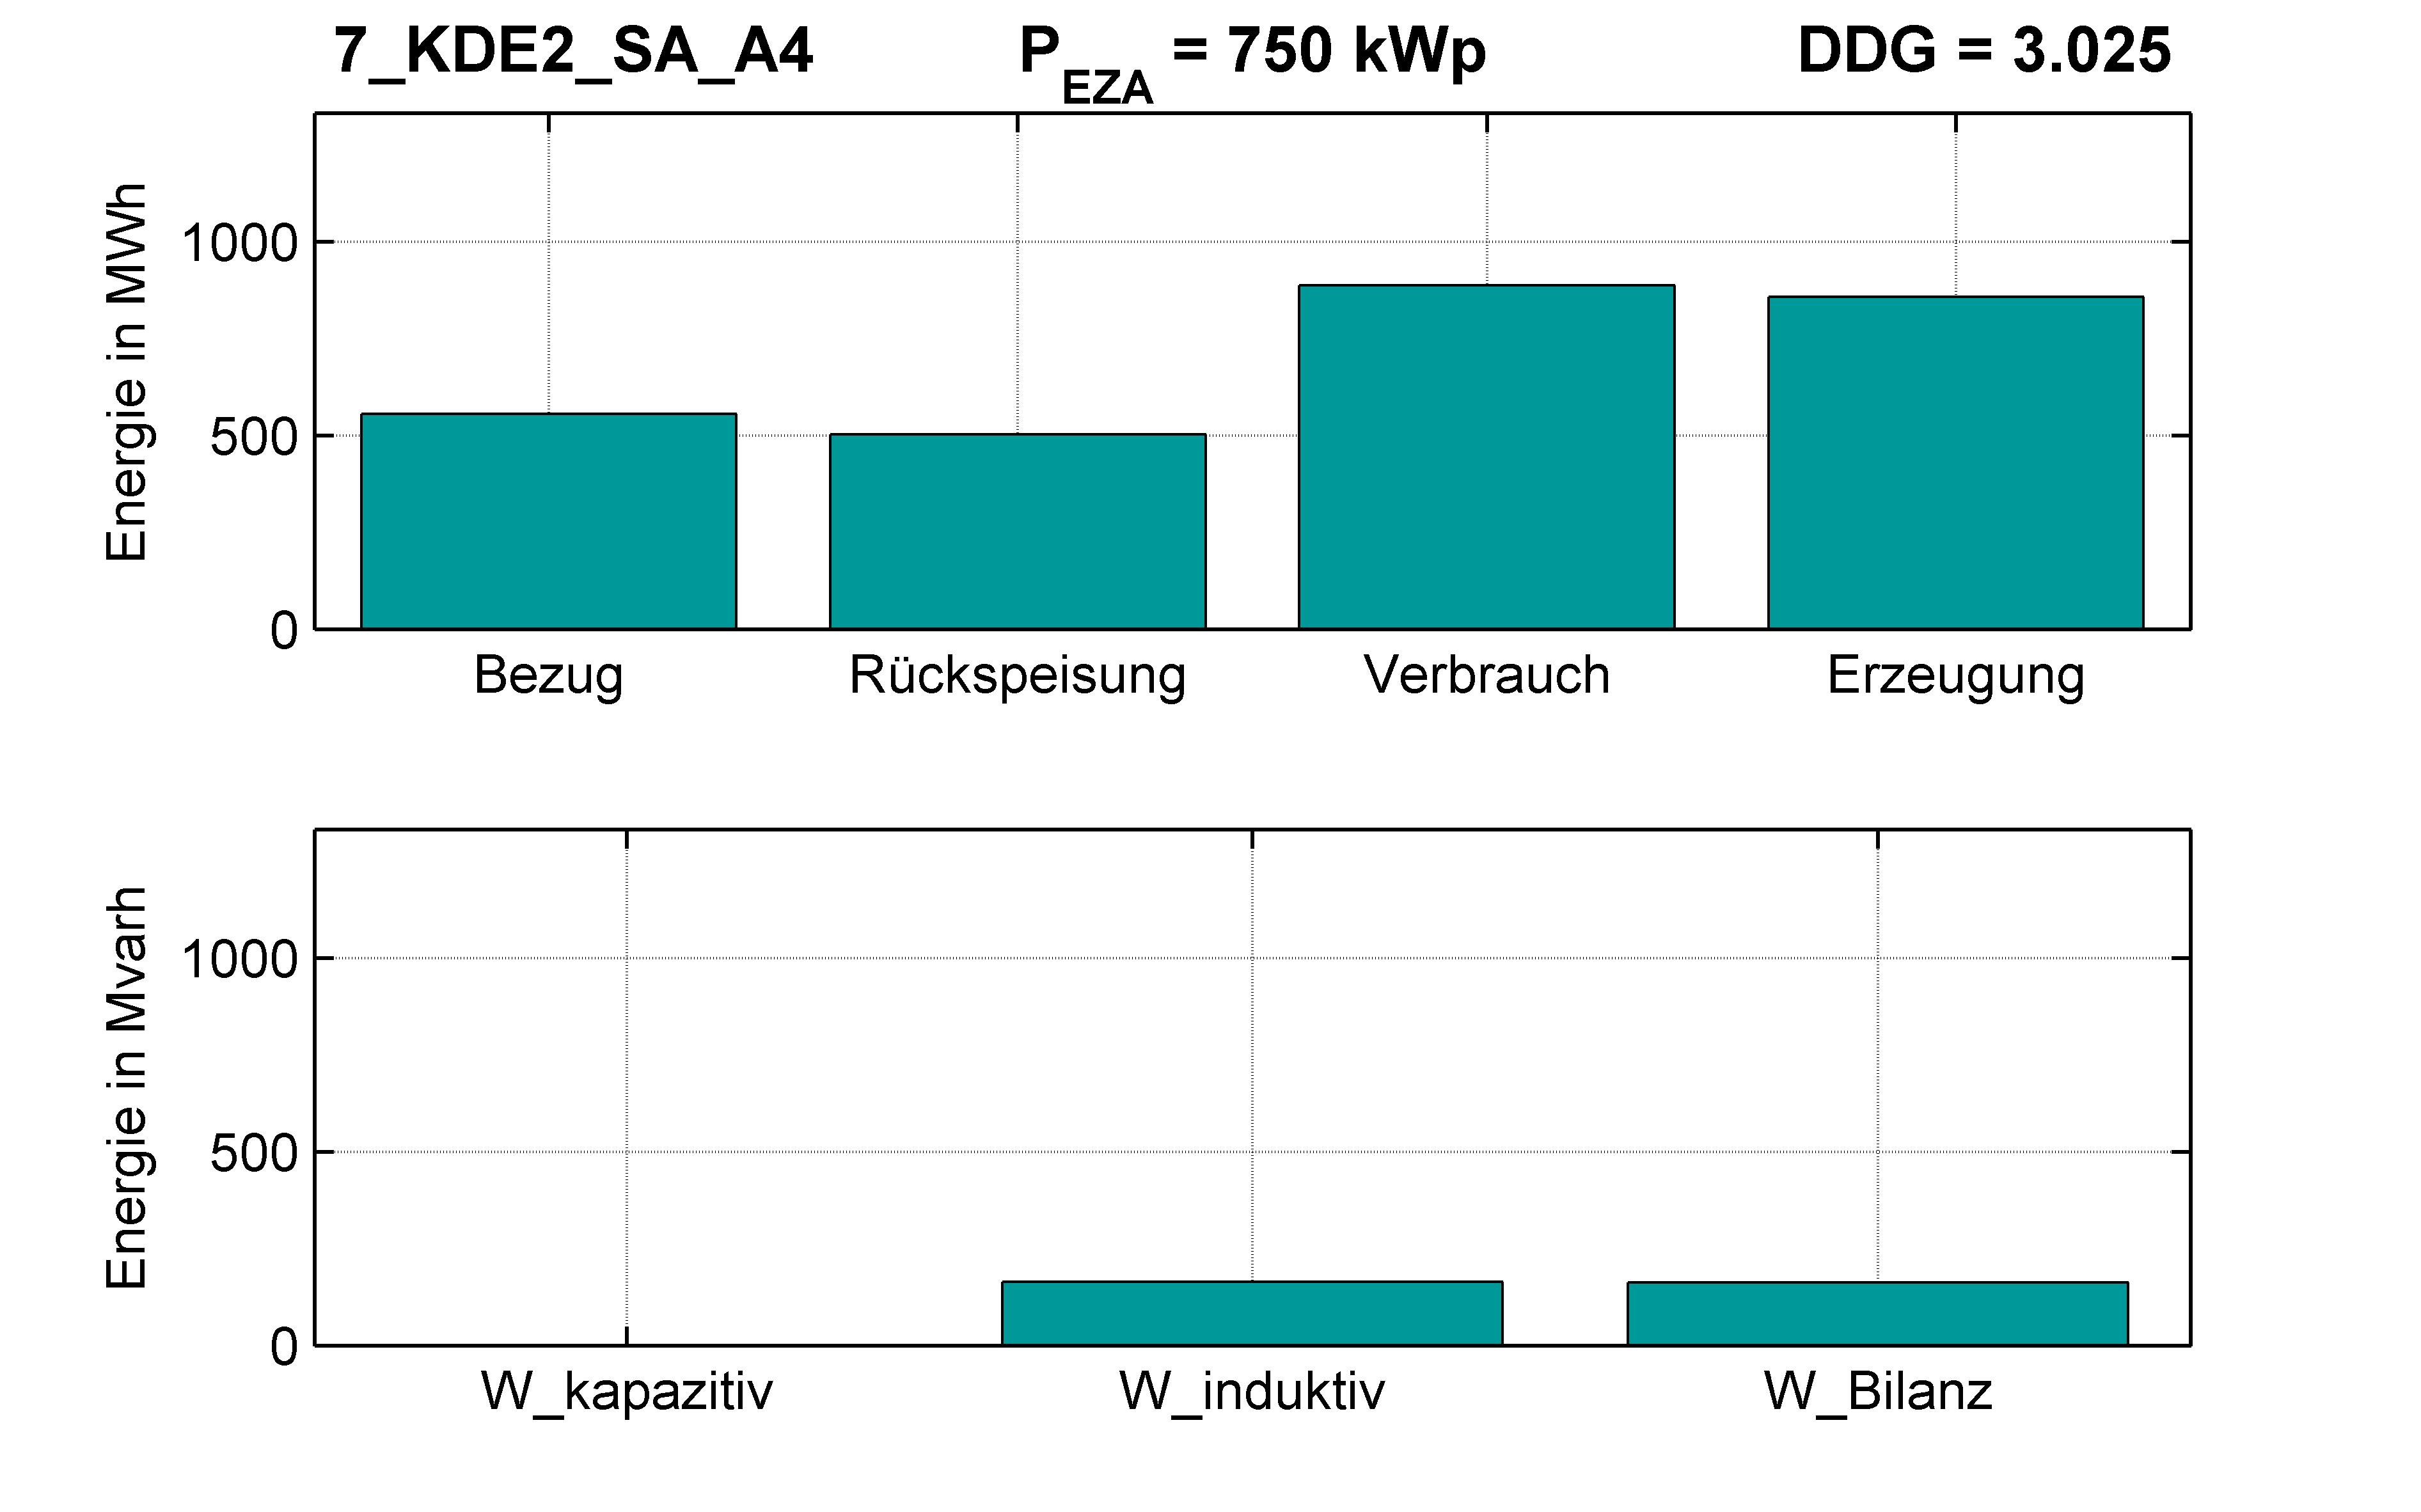 KDE2 | Längsregler (SA) A4 | PQ-Bilanz